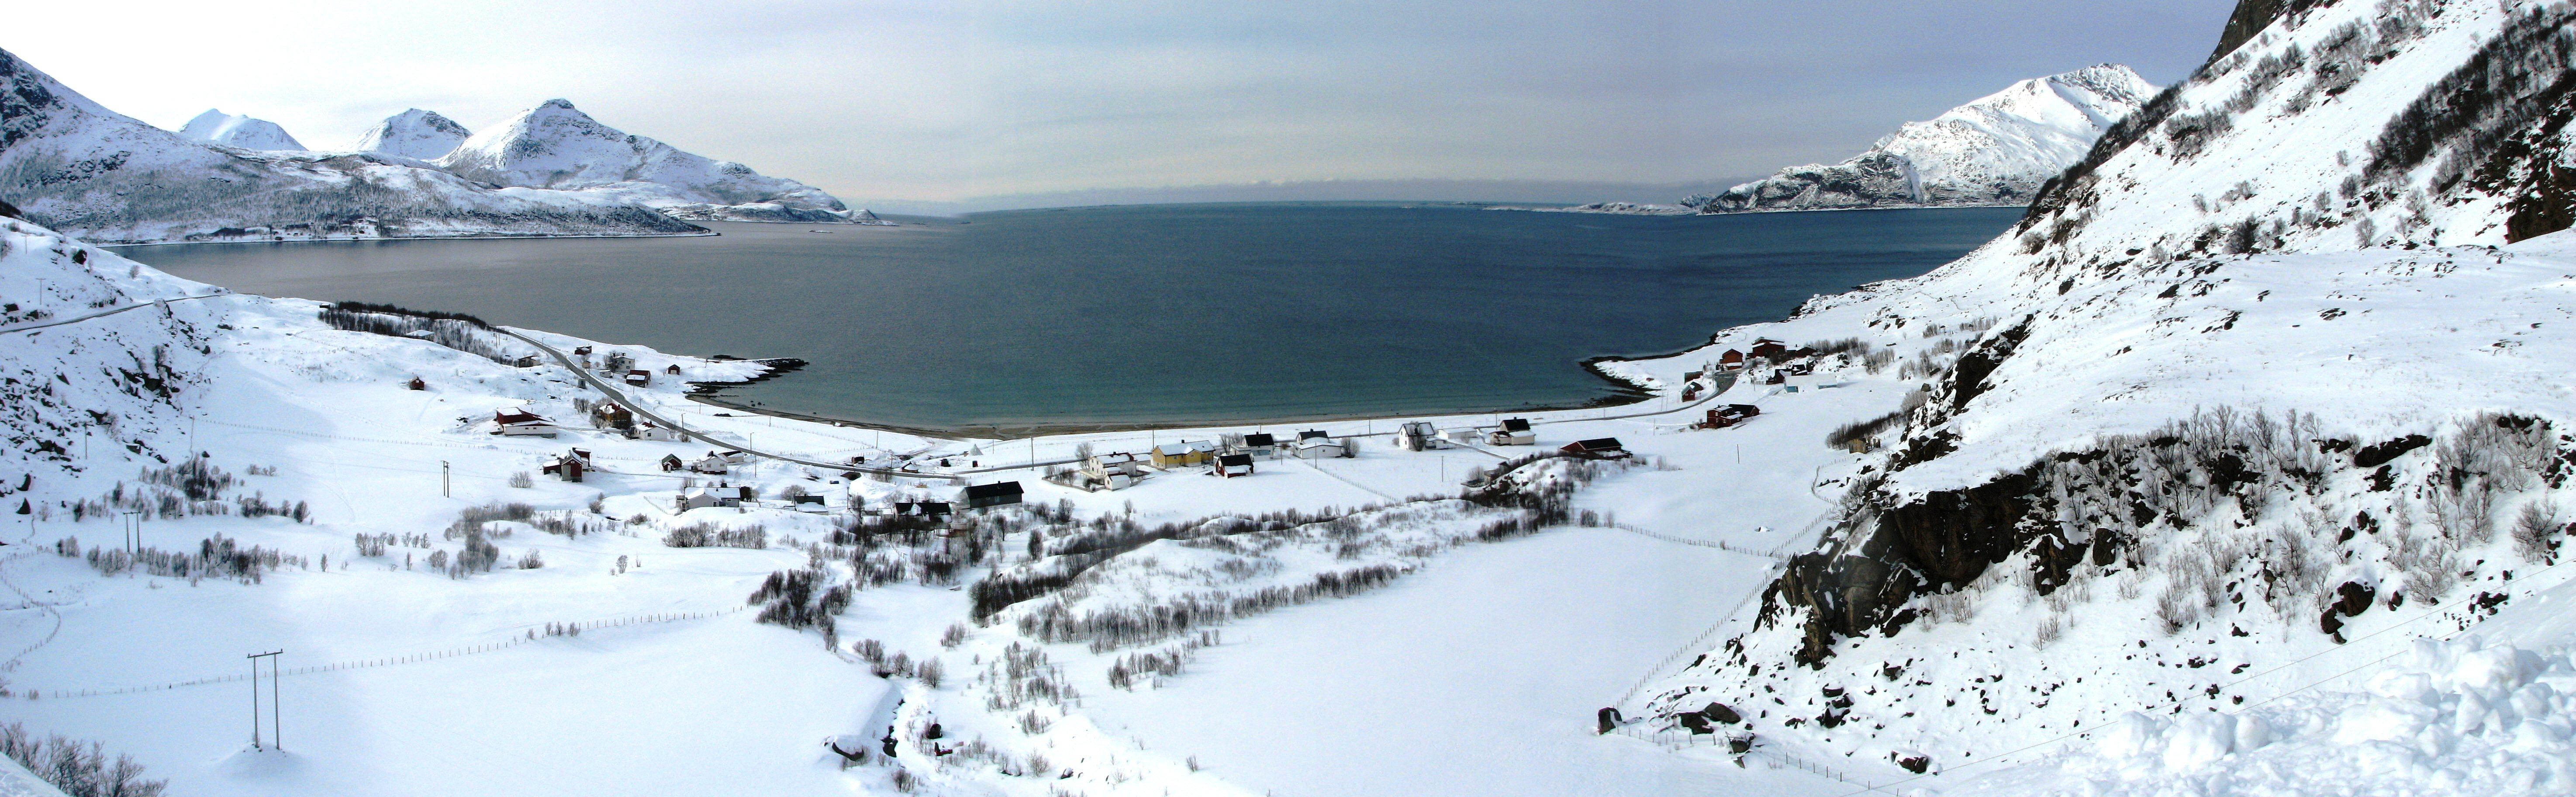 Grøtfjord03.jpg